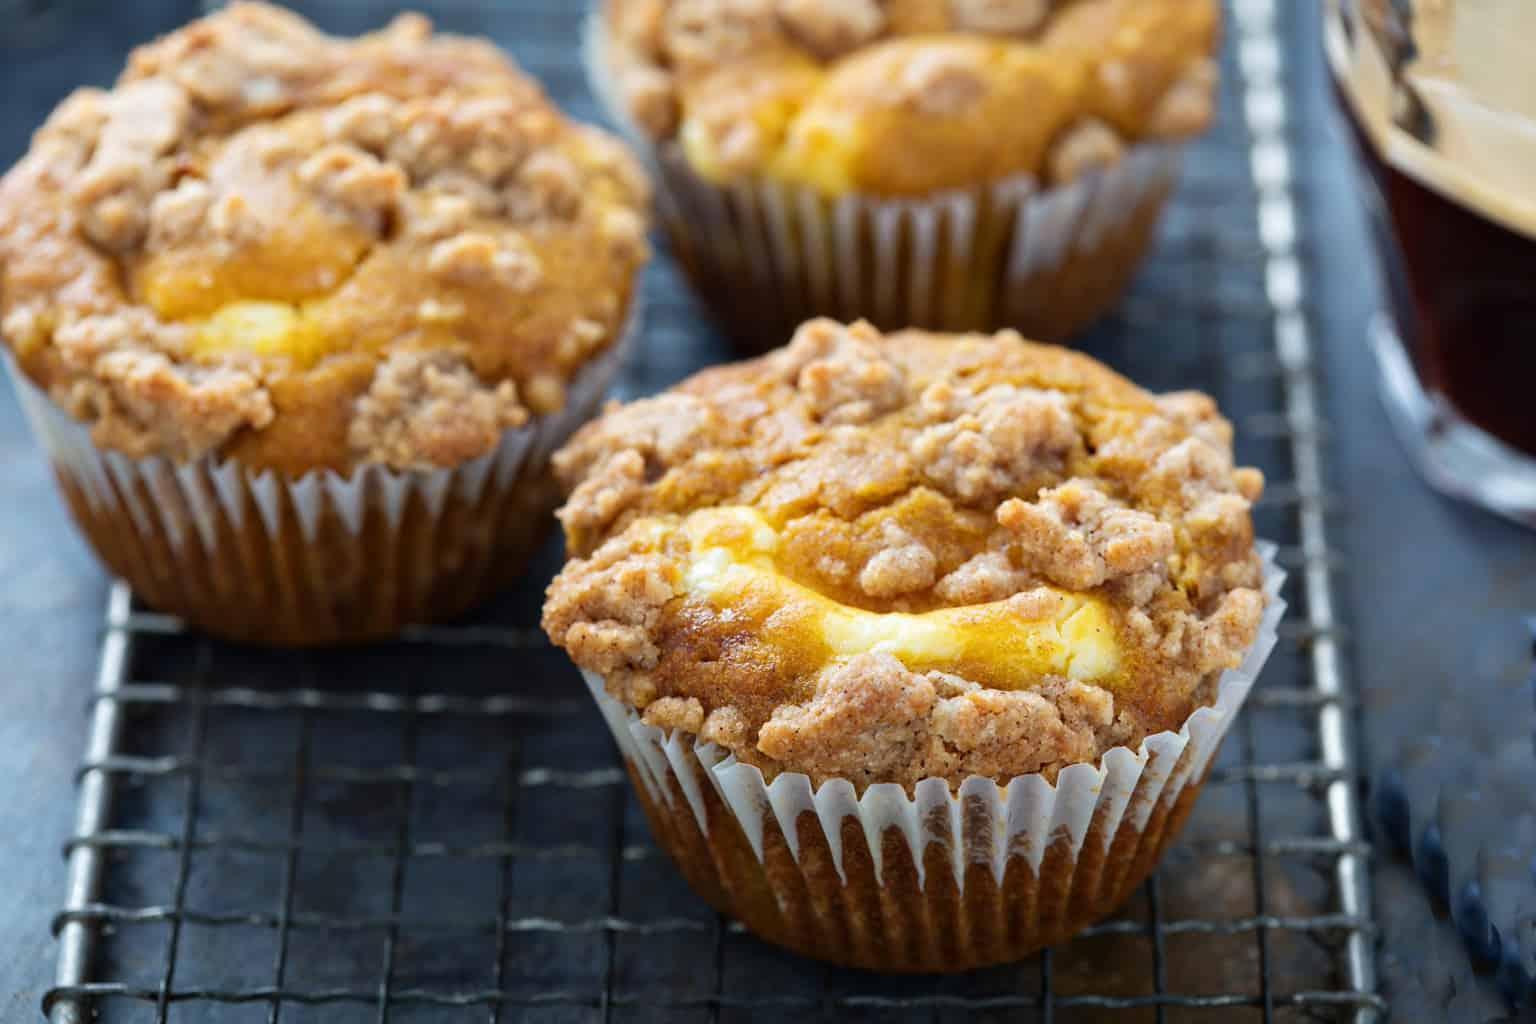 keto pumpkin cheesecake muffins cooling on a baking rack